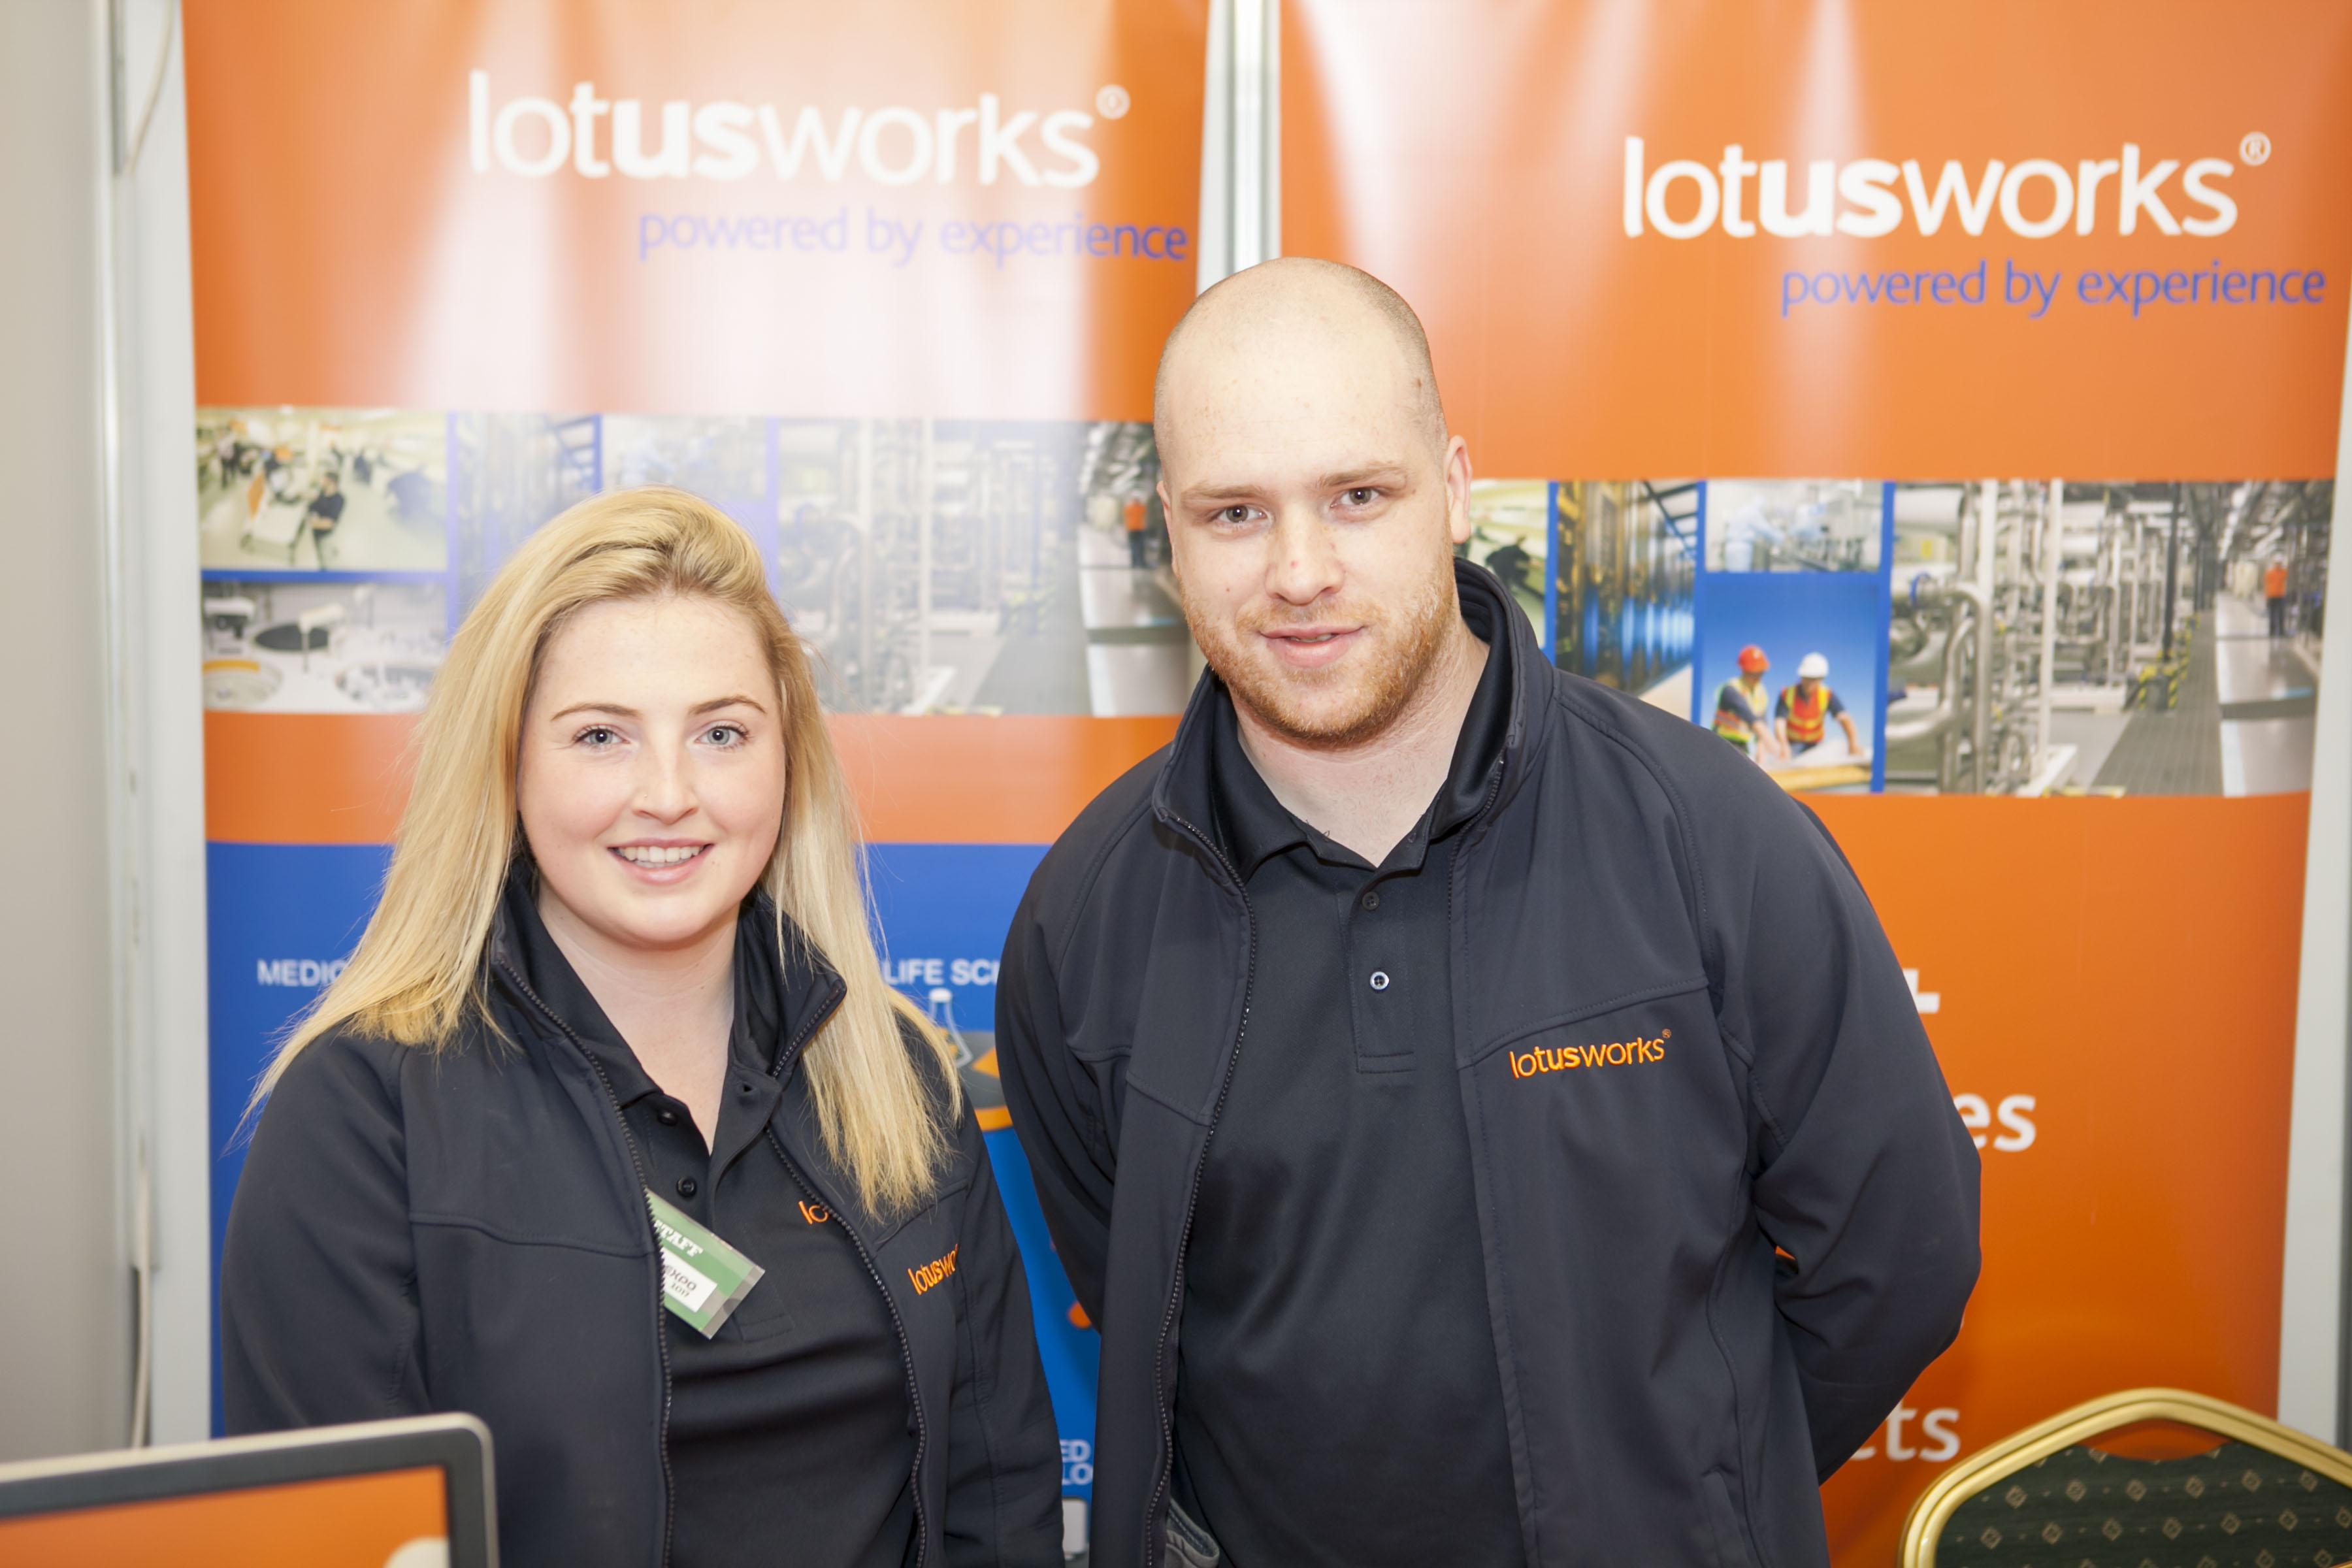 Jobs Expo Galway